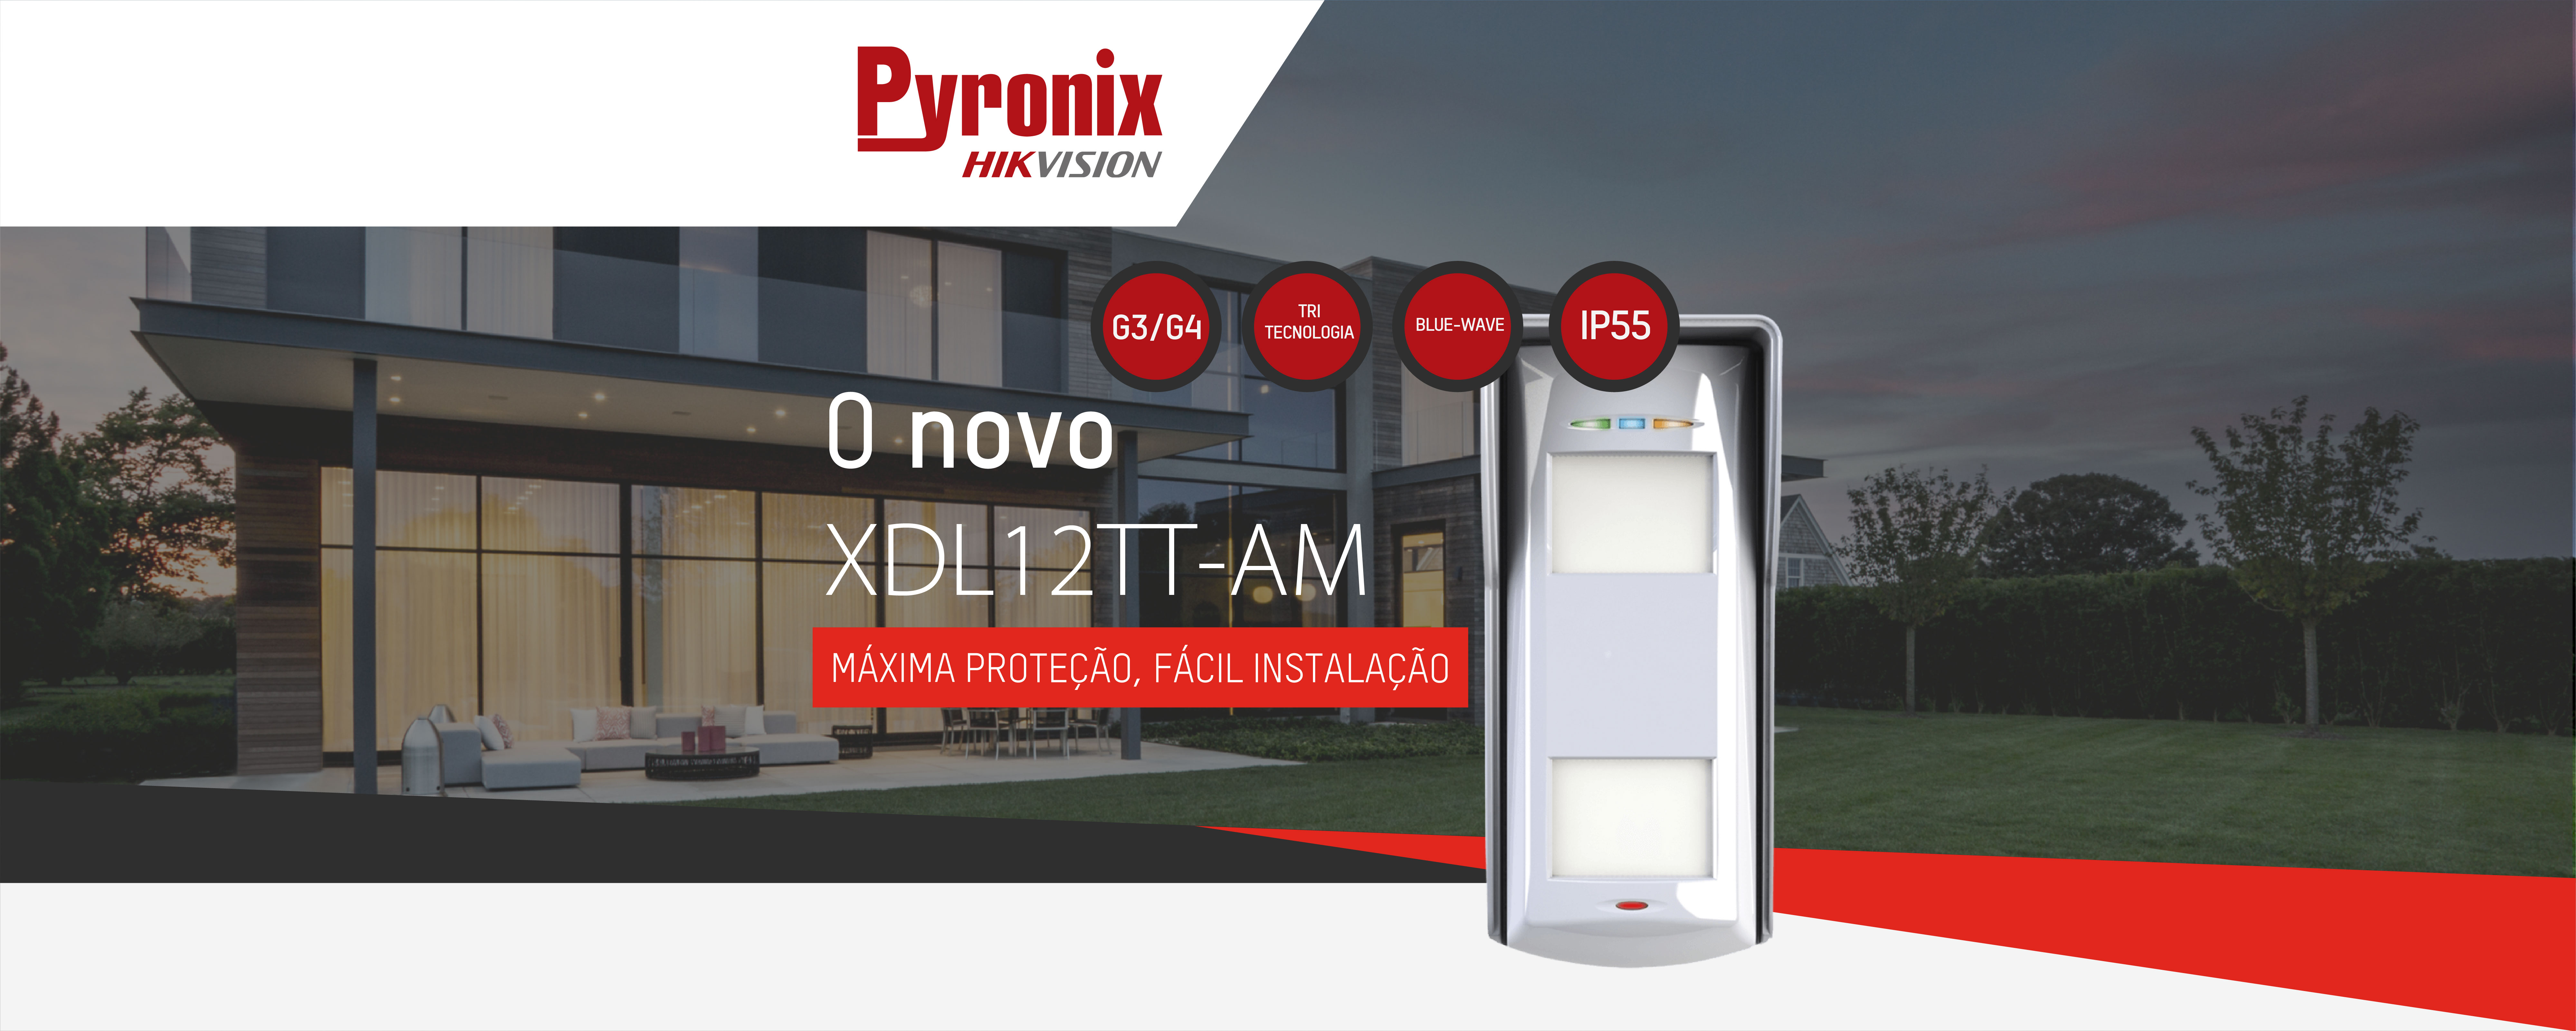 XDL12TT-AMPyronix